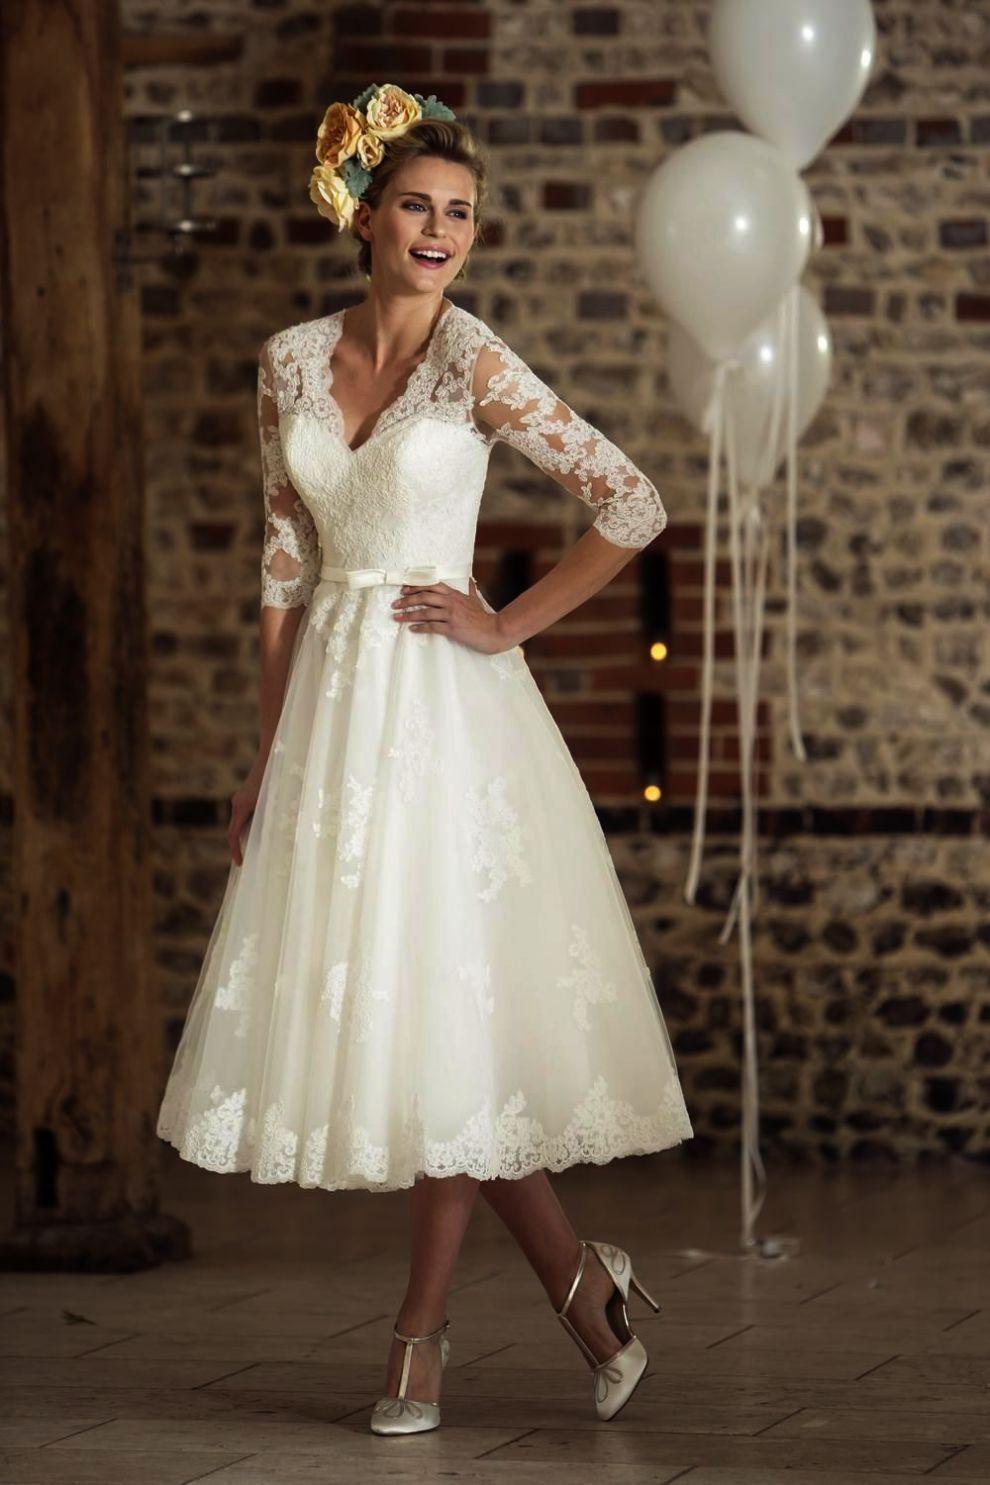 50's Style Dress Patterns Australia Of: 50s Style Wedding Dresses Pattern At Reisefeber.org